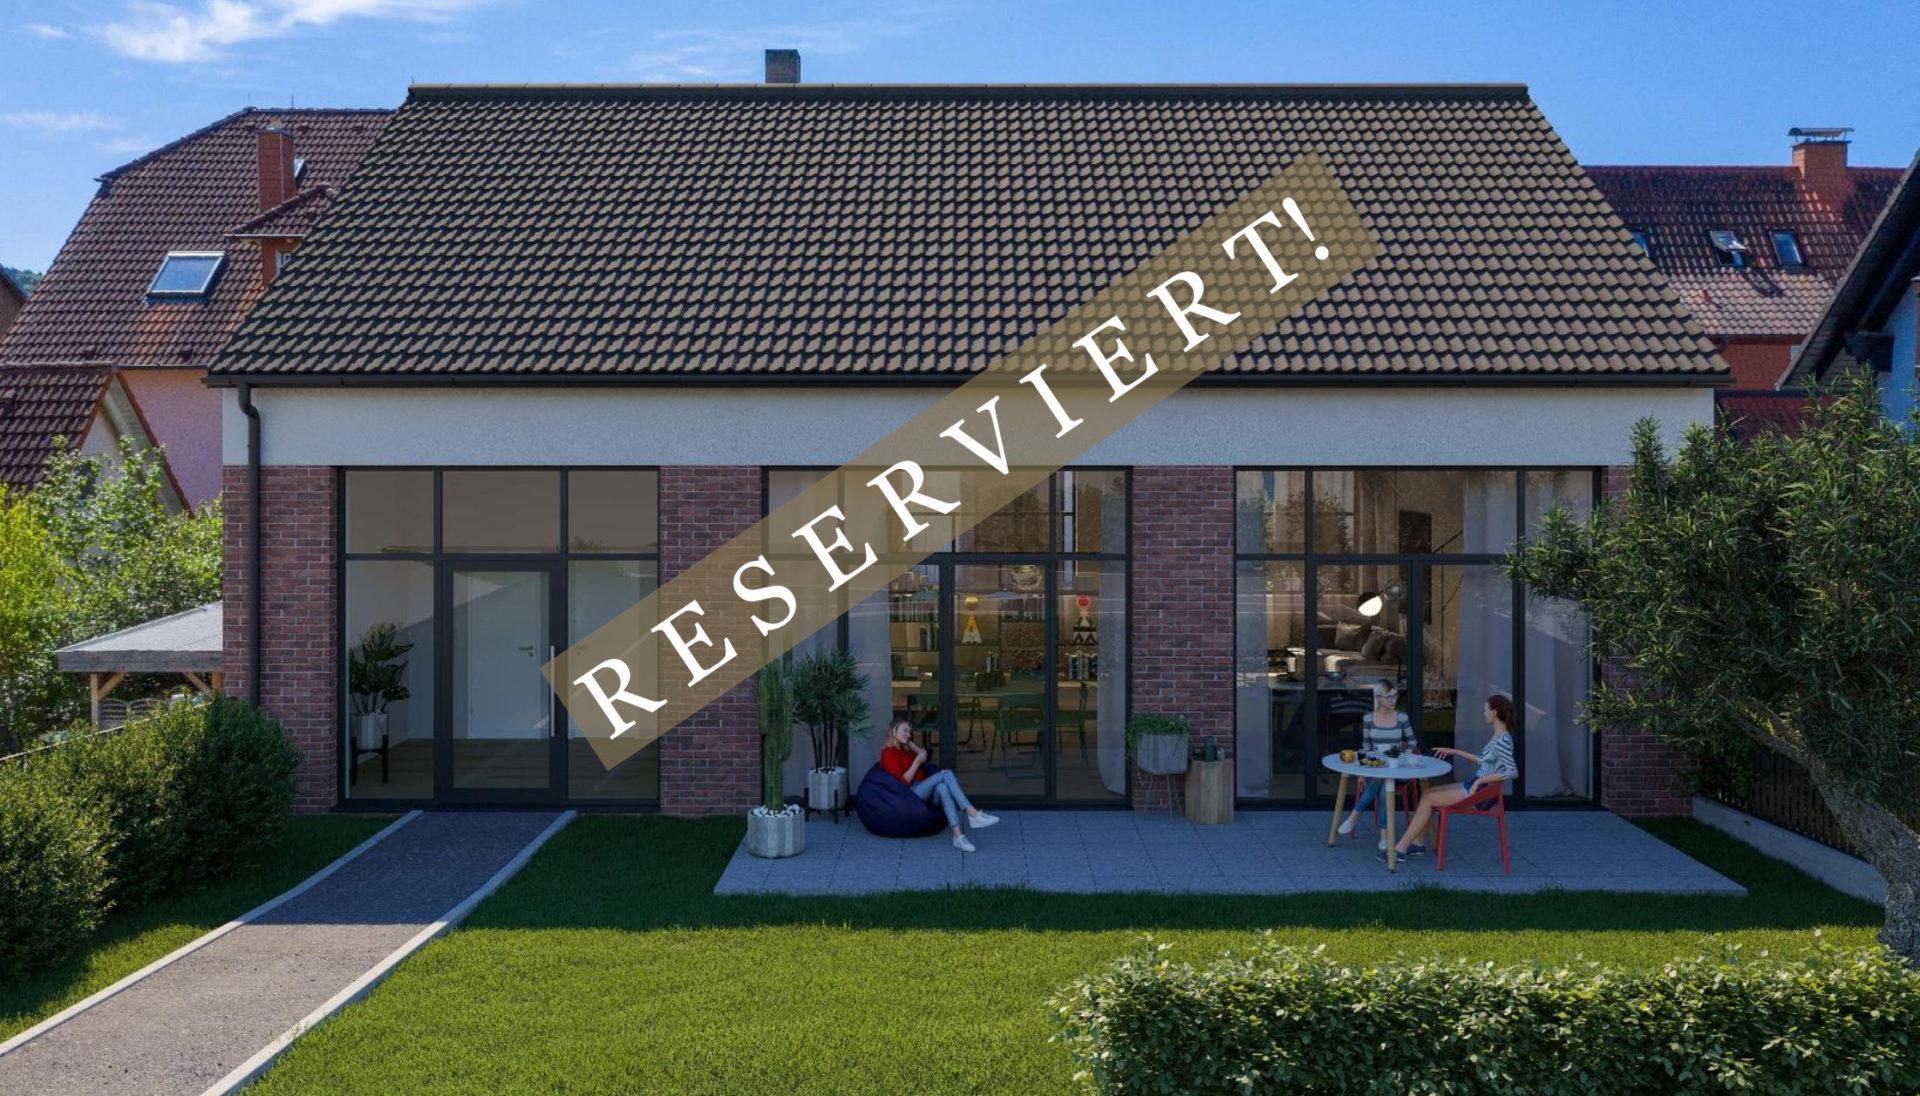 20210824_Vorlage_RESERV_alois_